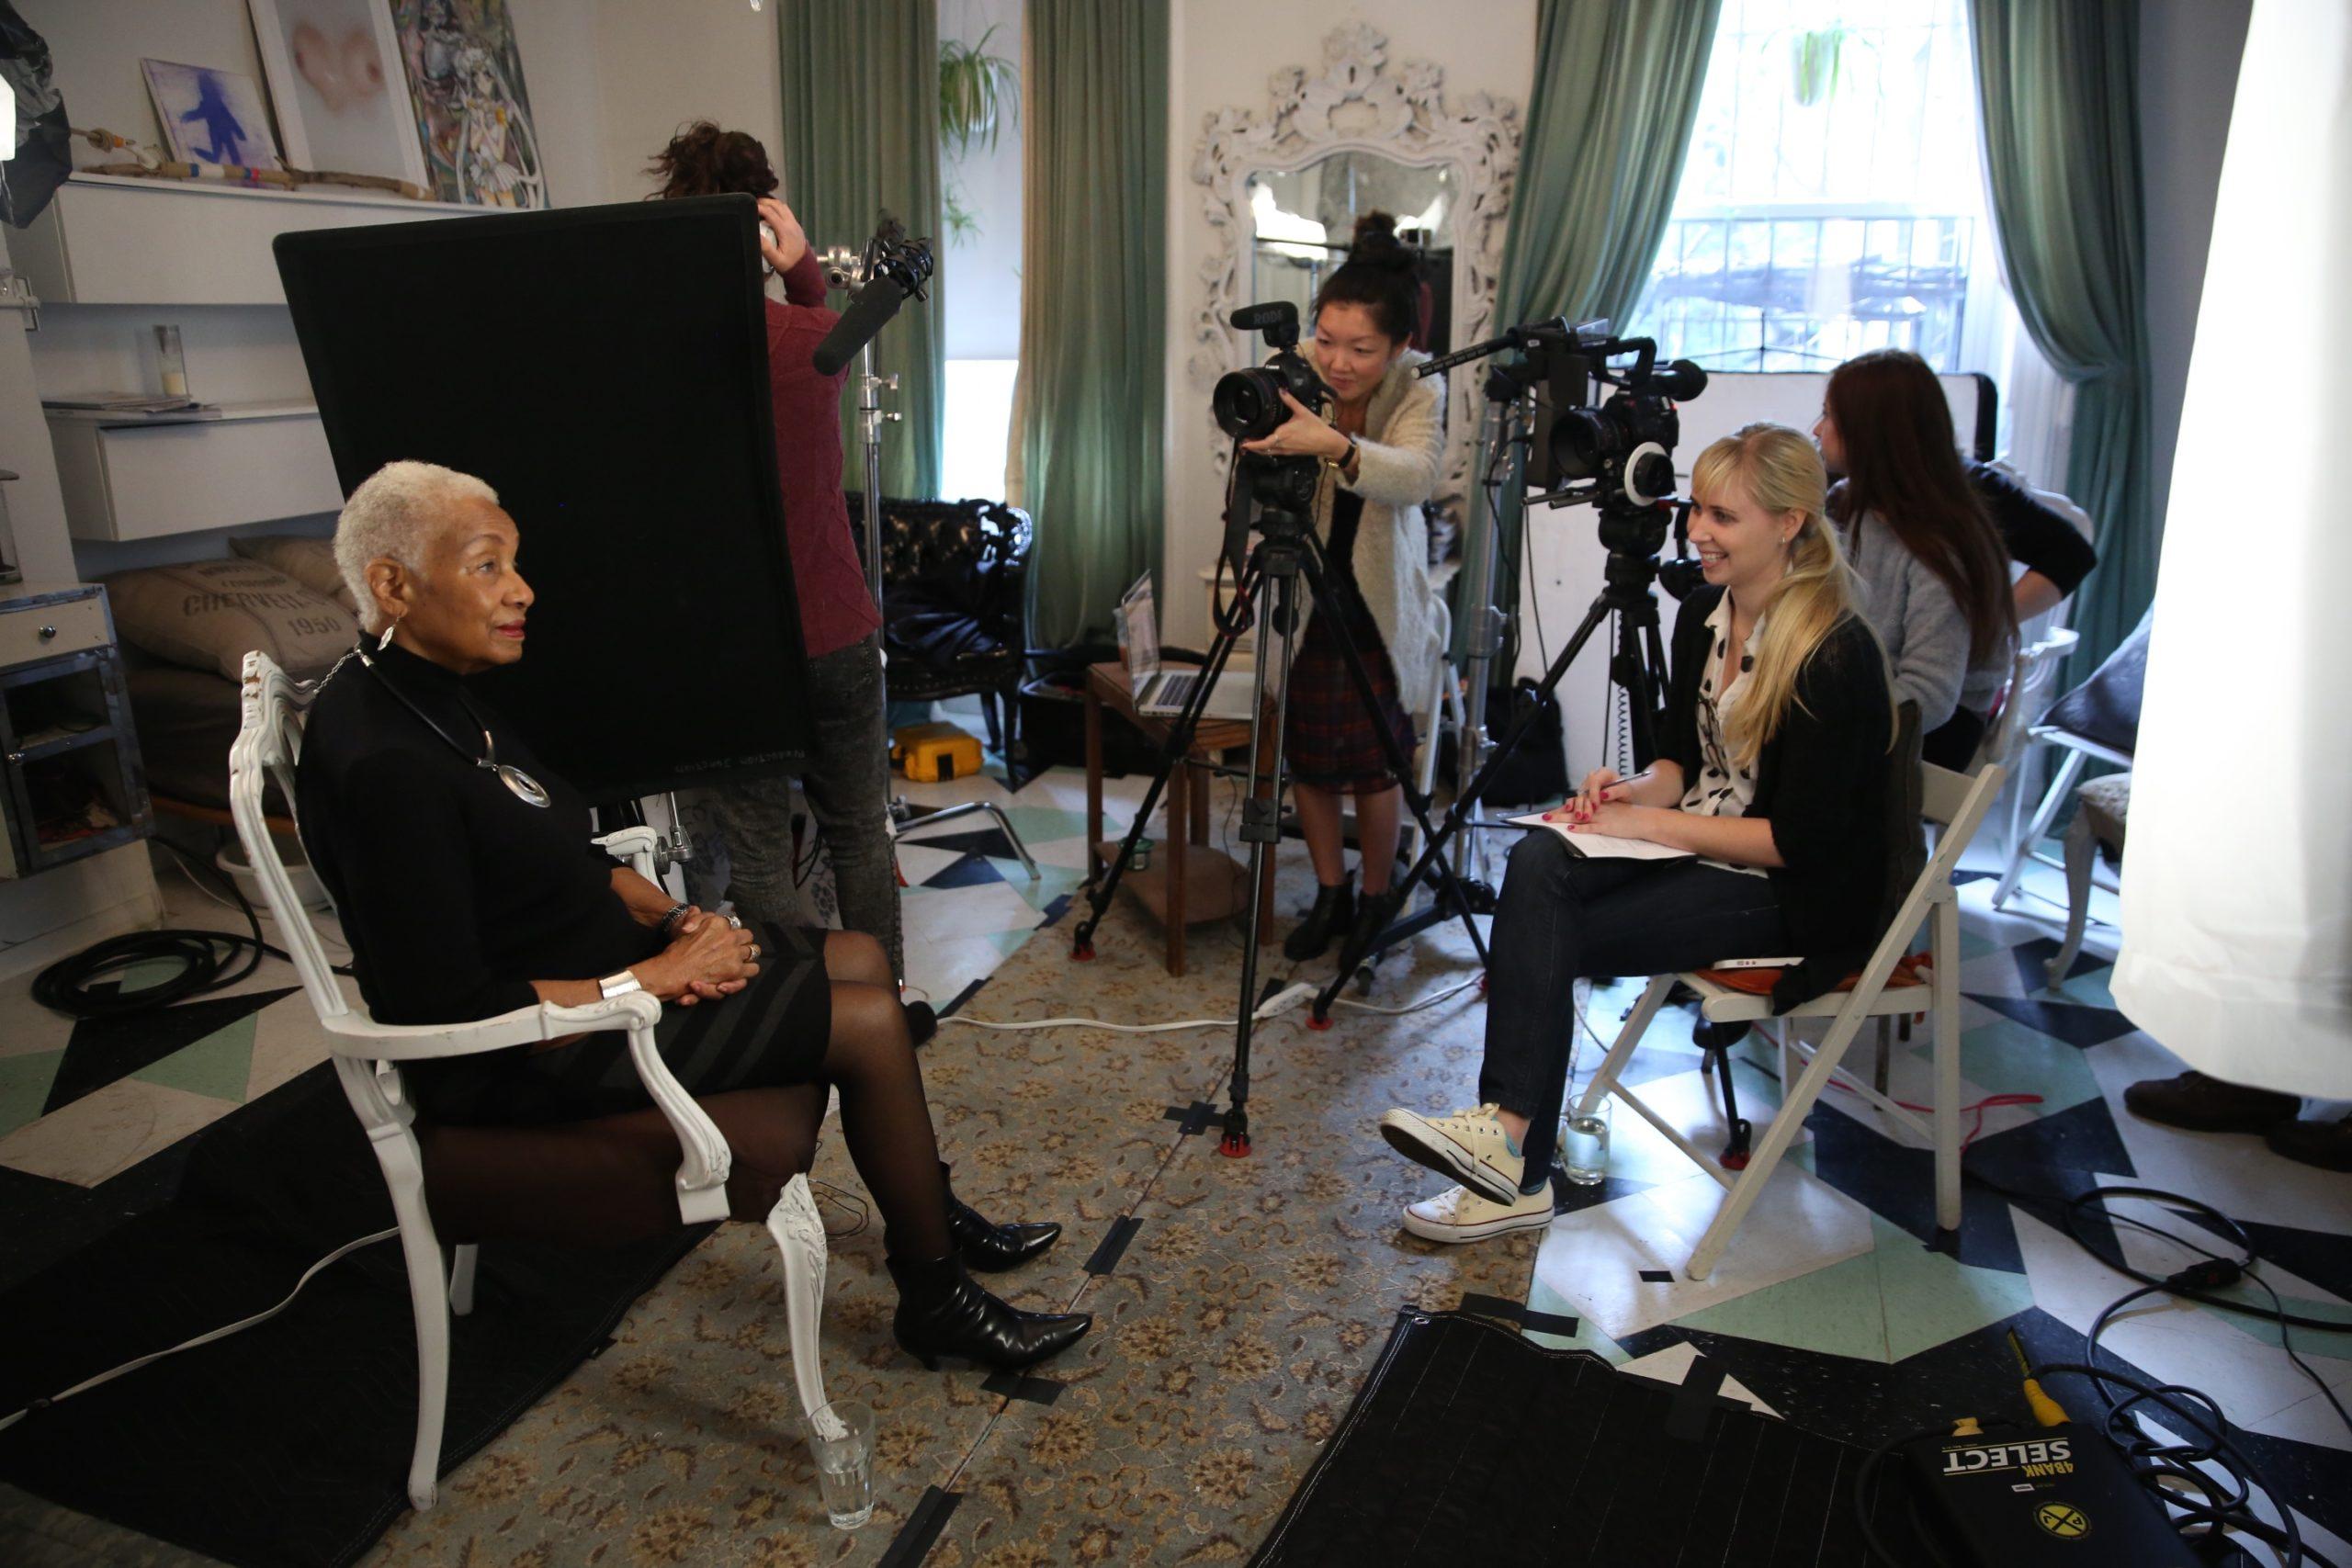 Film production on female entrepreneurs and feminism